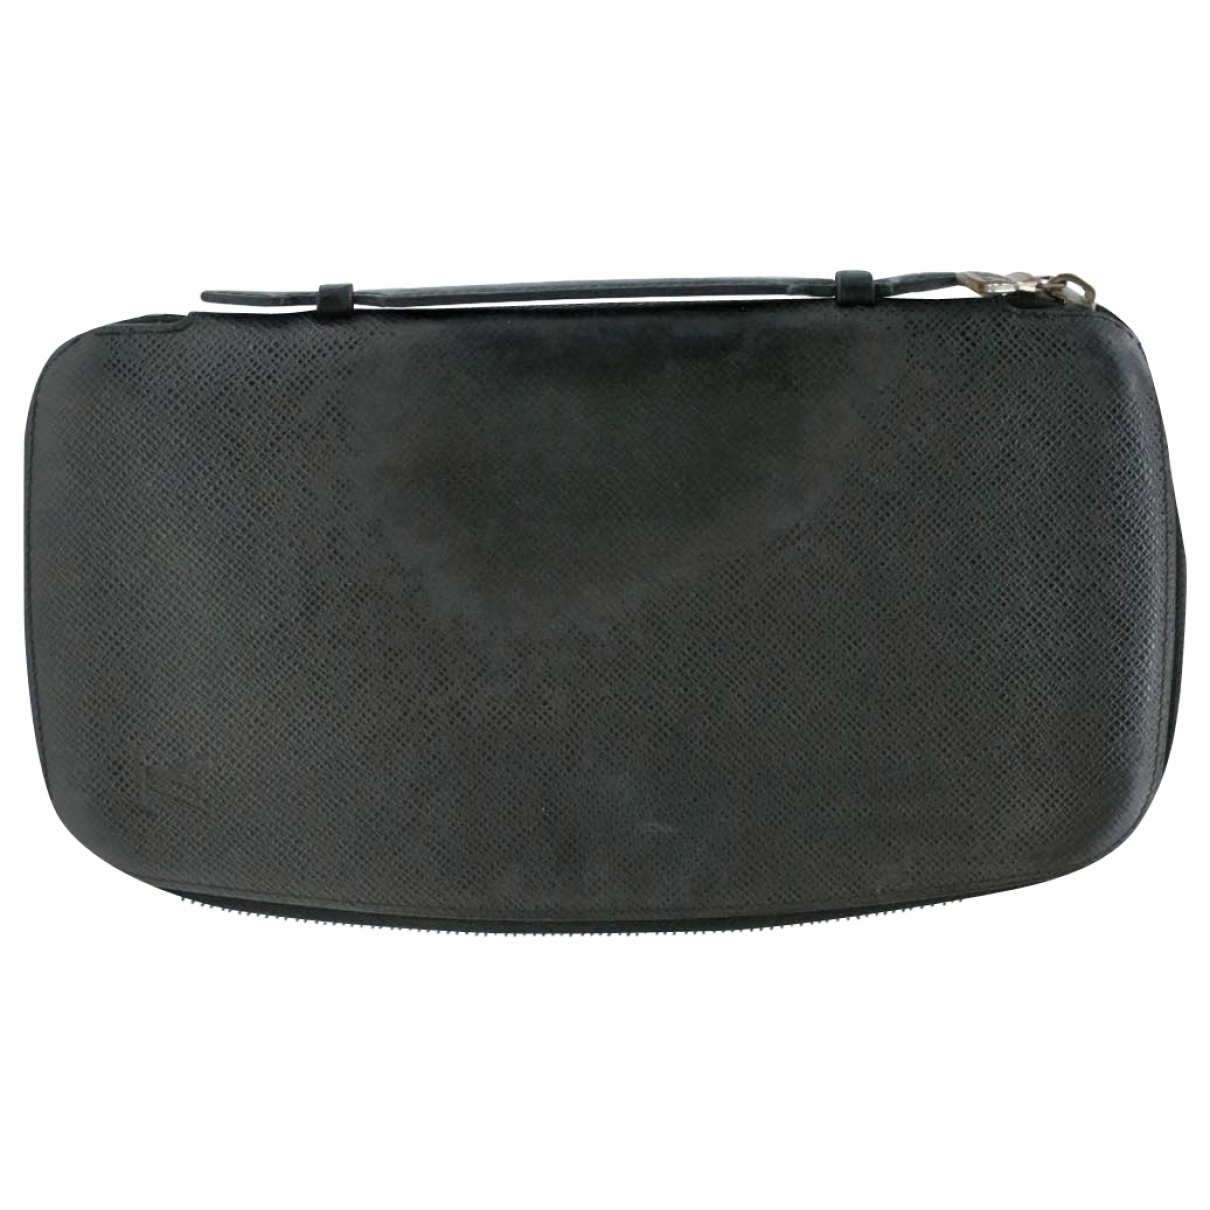 Louis Vuitton \N Black Leather Travel bag for Women \N